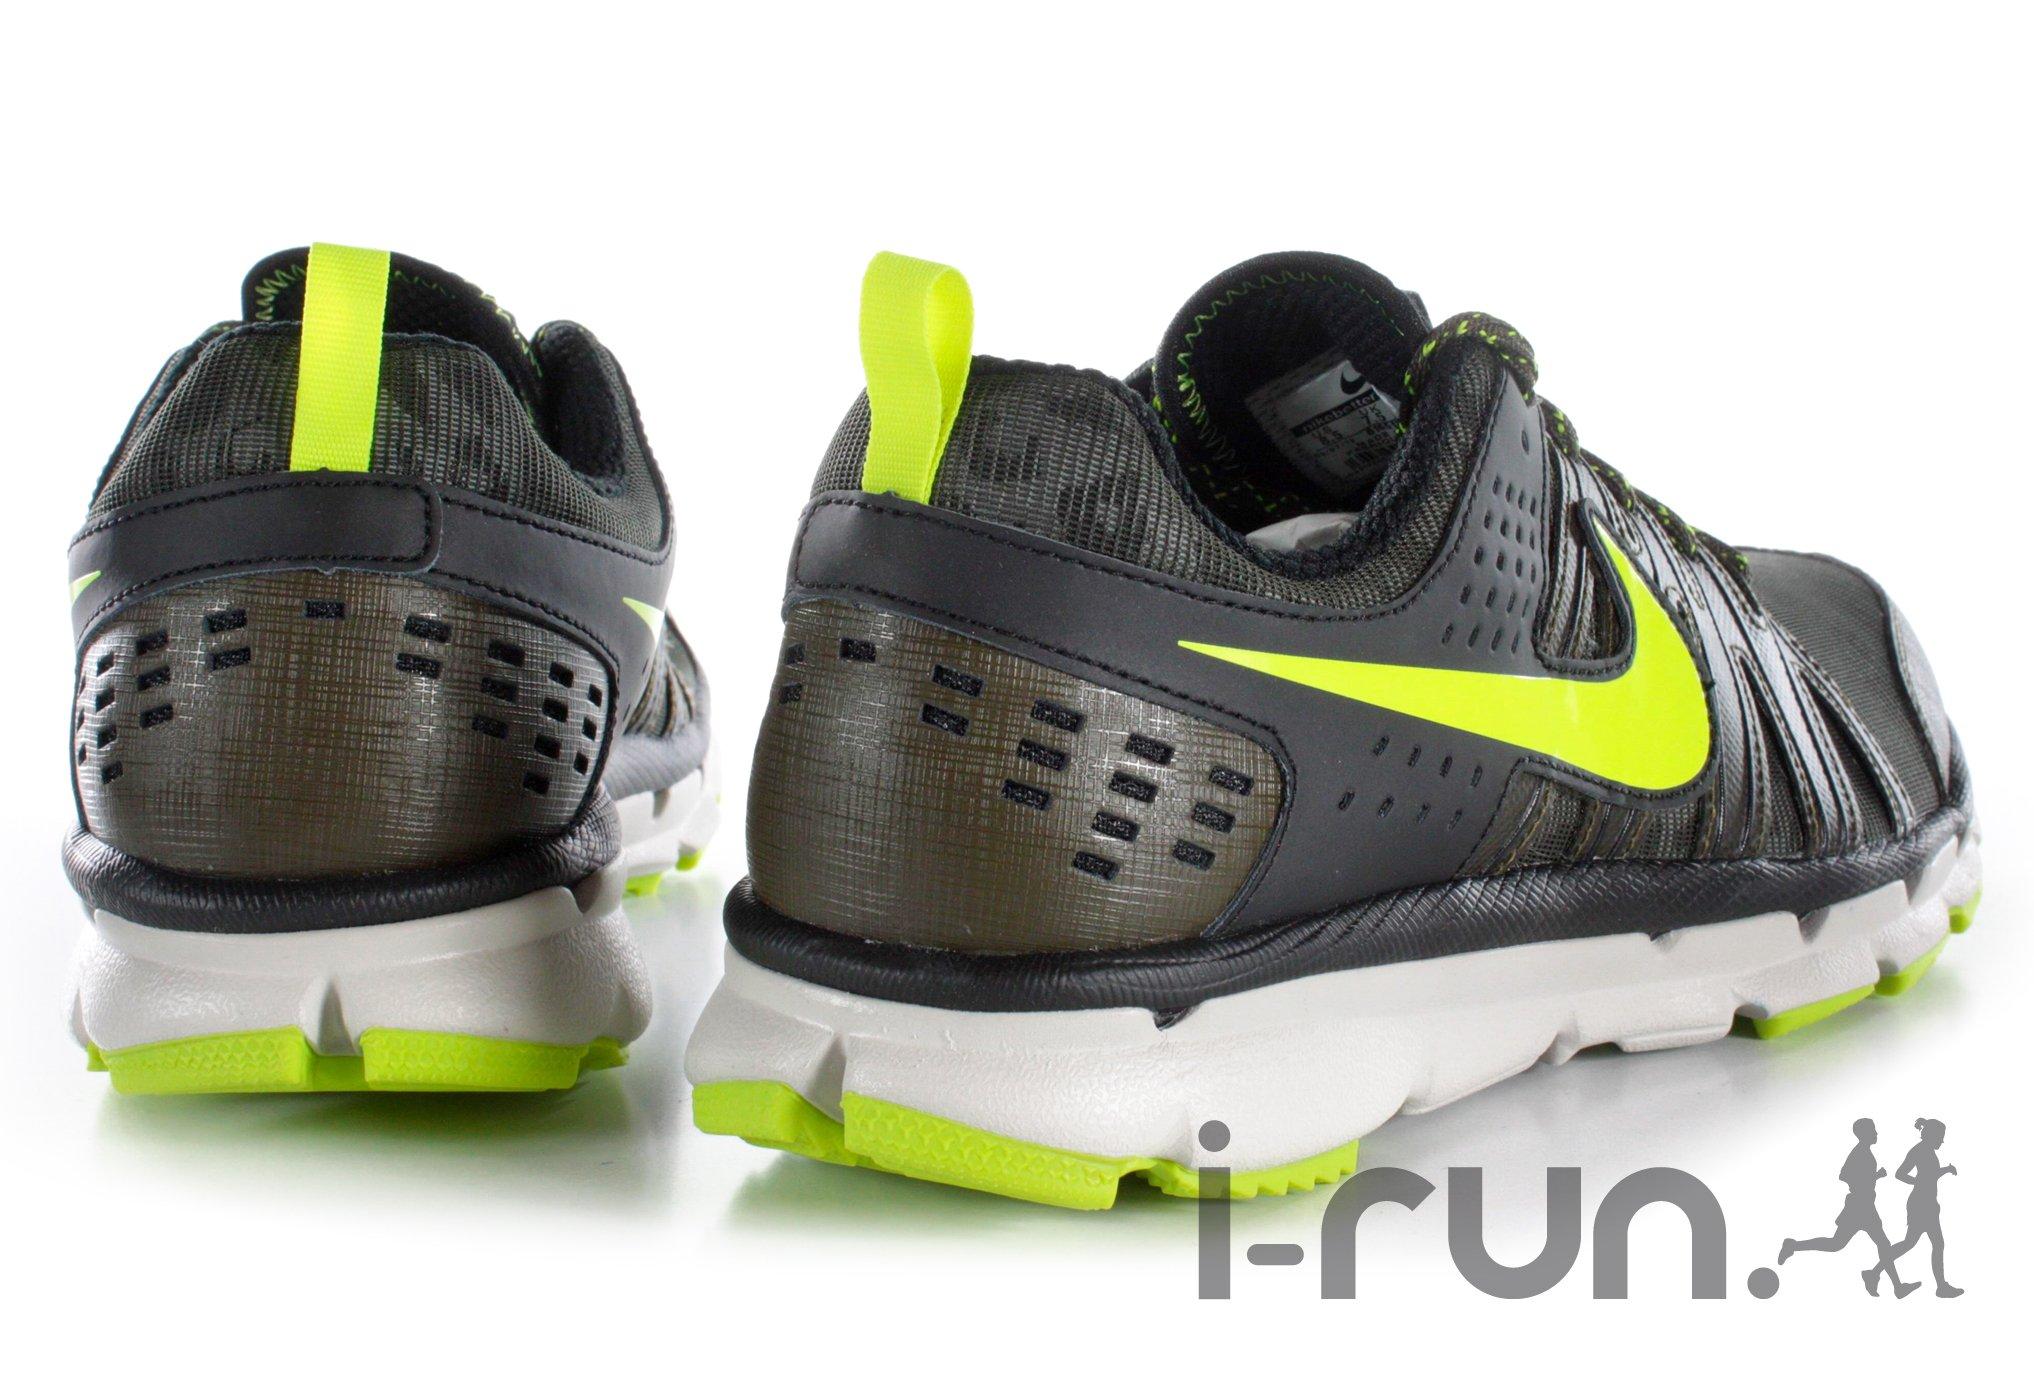 2192a819cec2a Chaussures De Running Nike Flex Trail 2 Shield